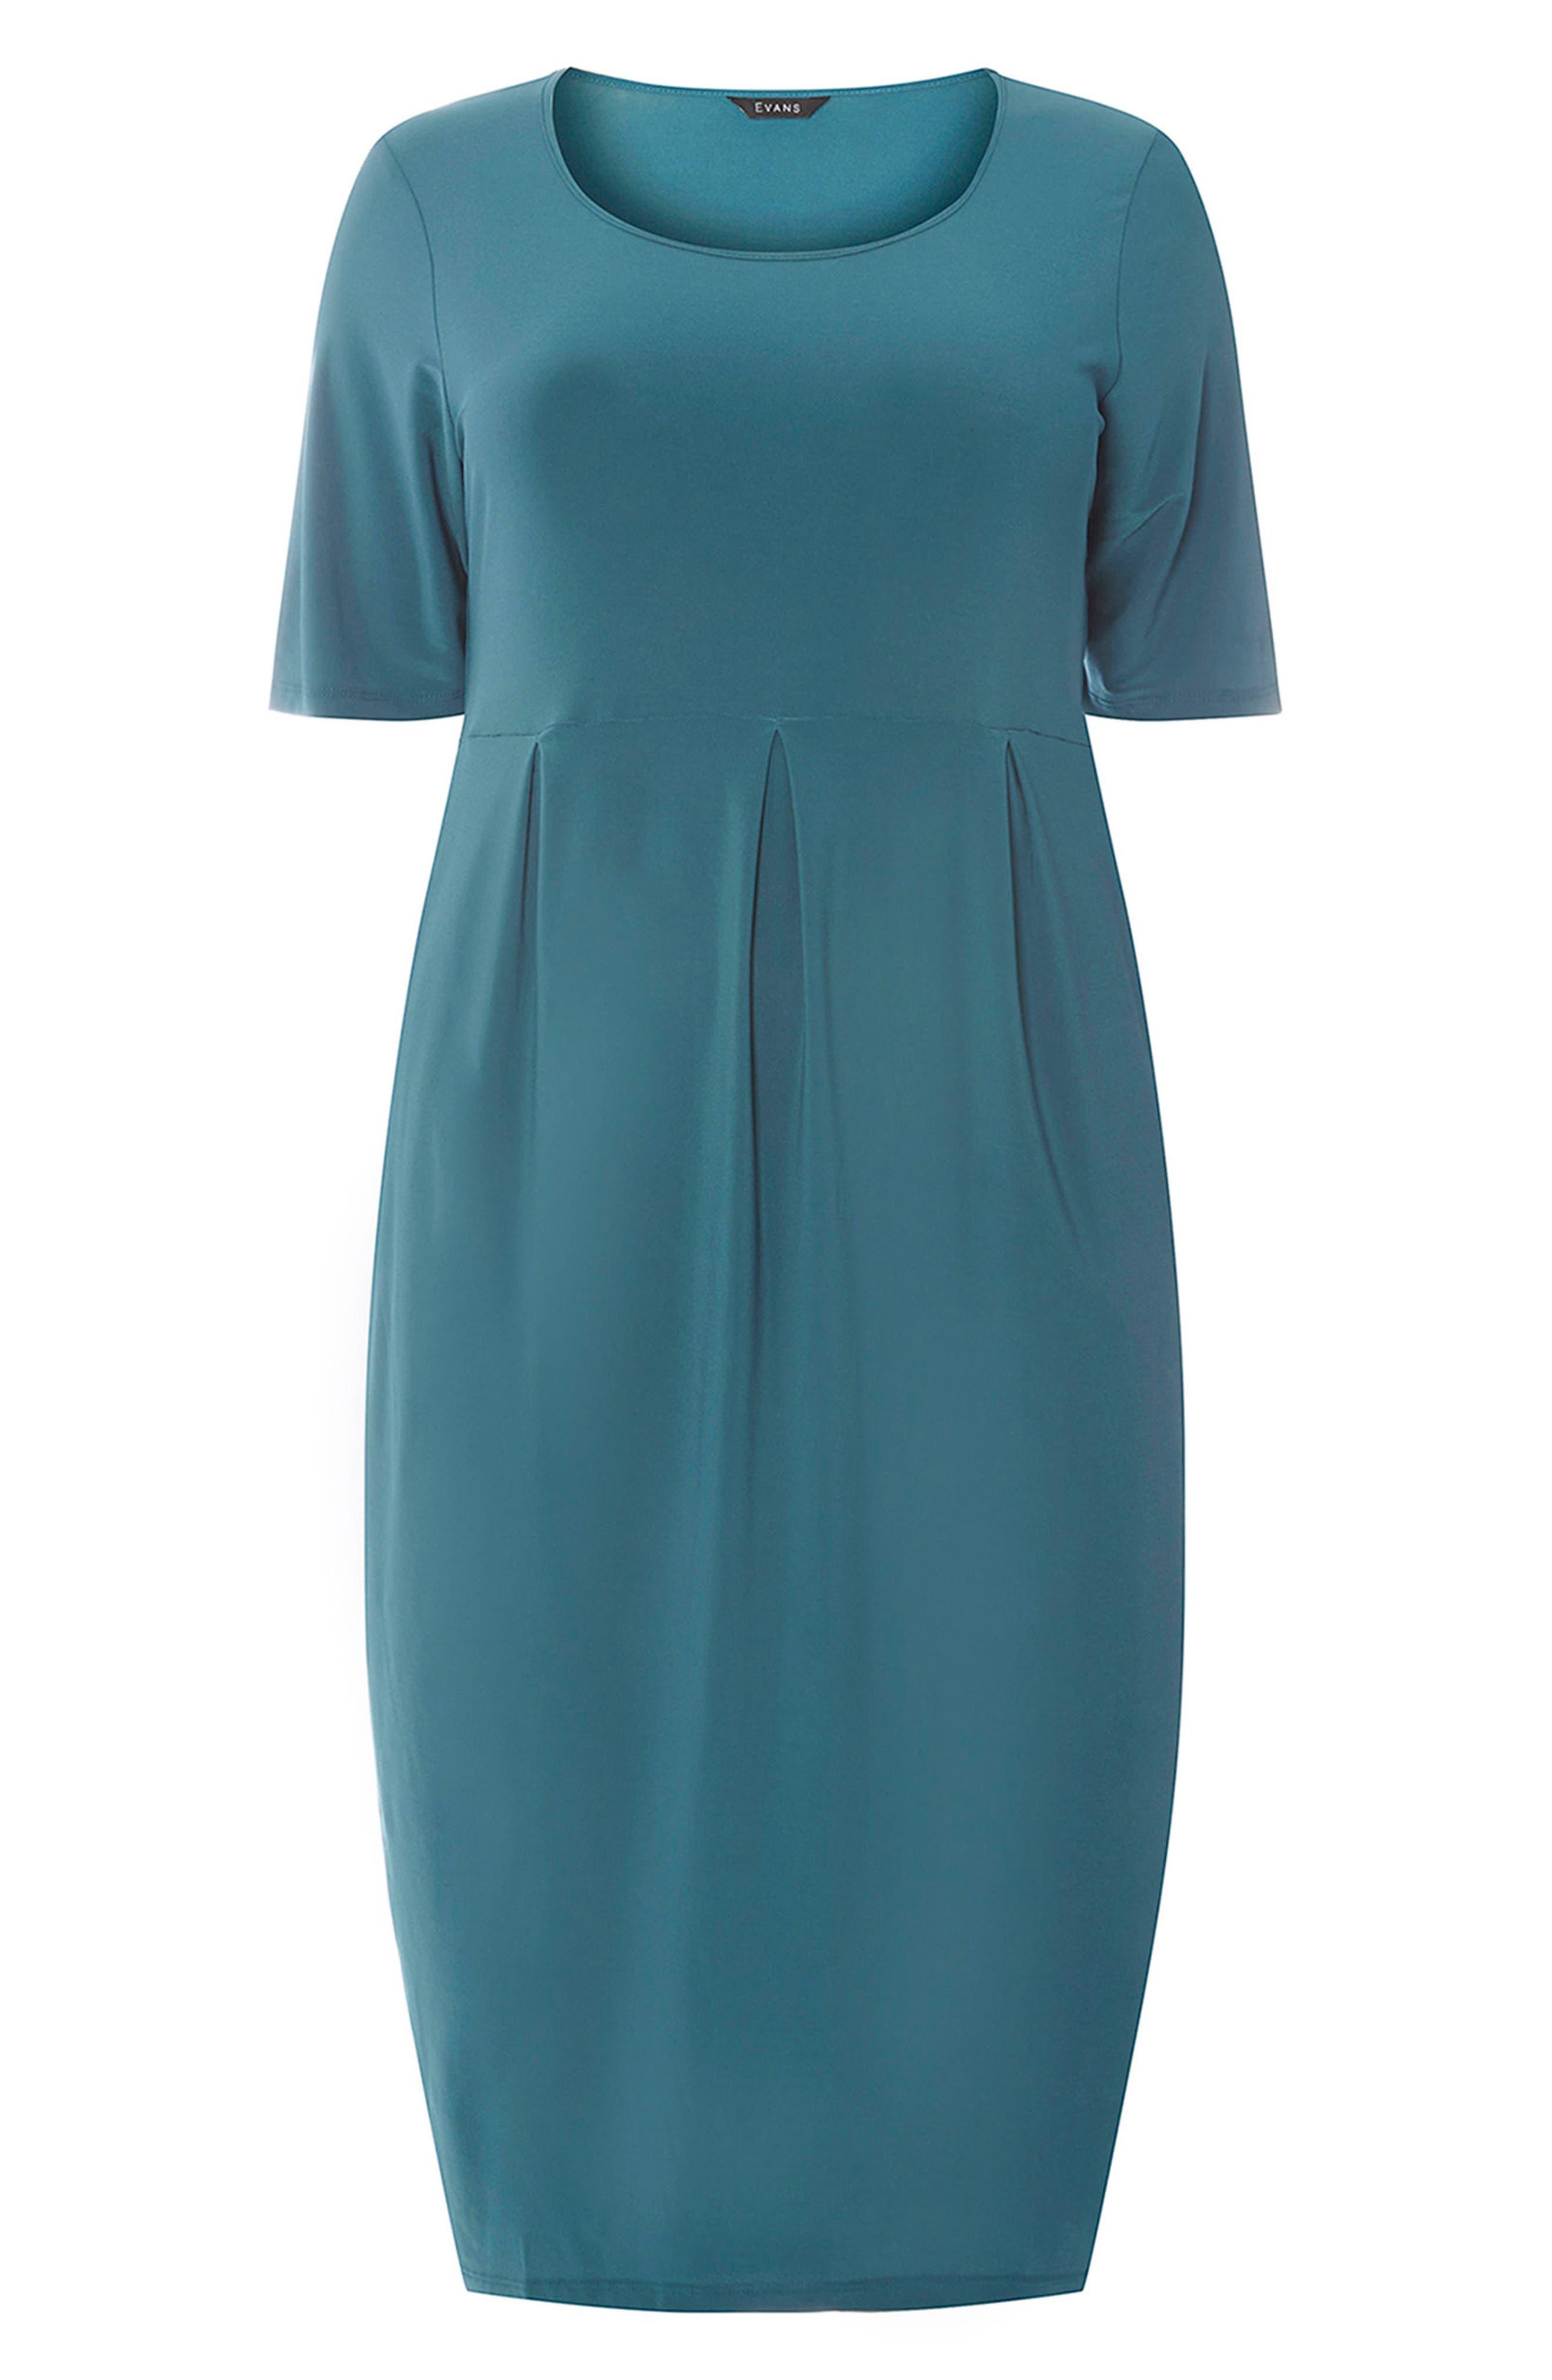 Pocket Dress,                             Alternate thumbnail 4, color,                             300